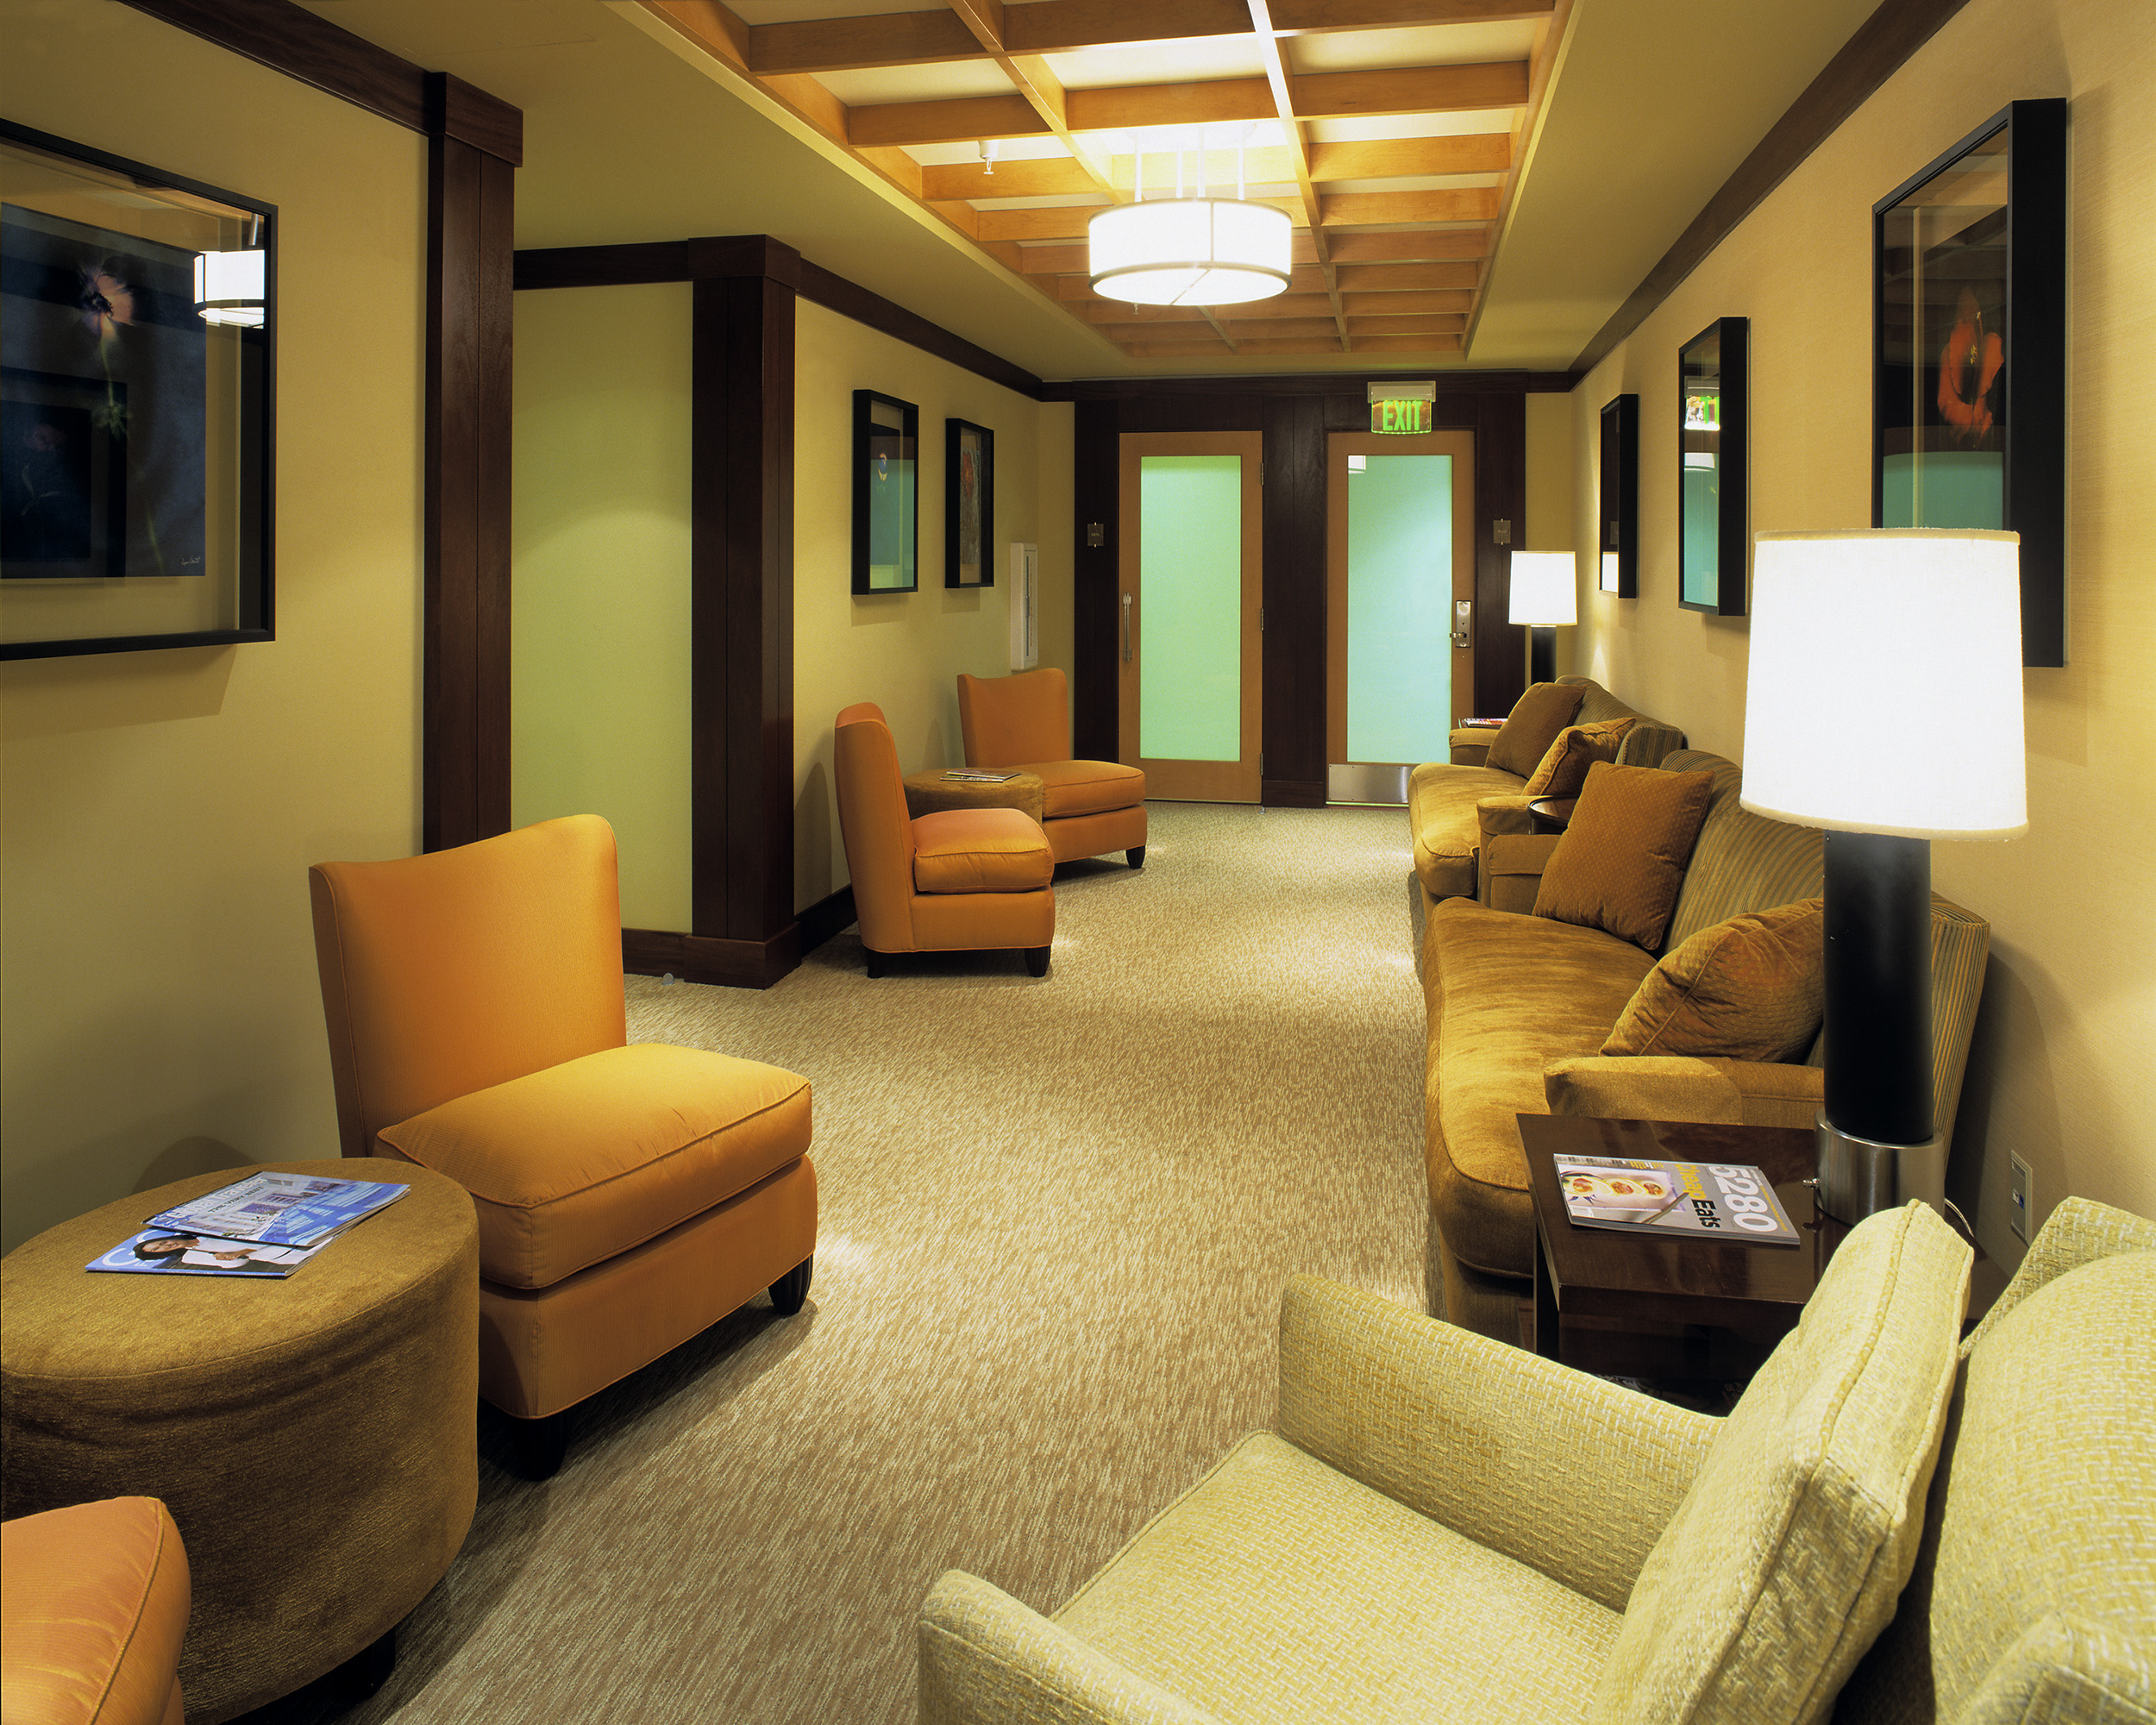 st_julien_hotel_boulder_colorado_interior.jpg